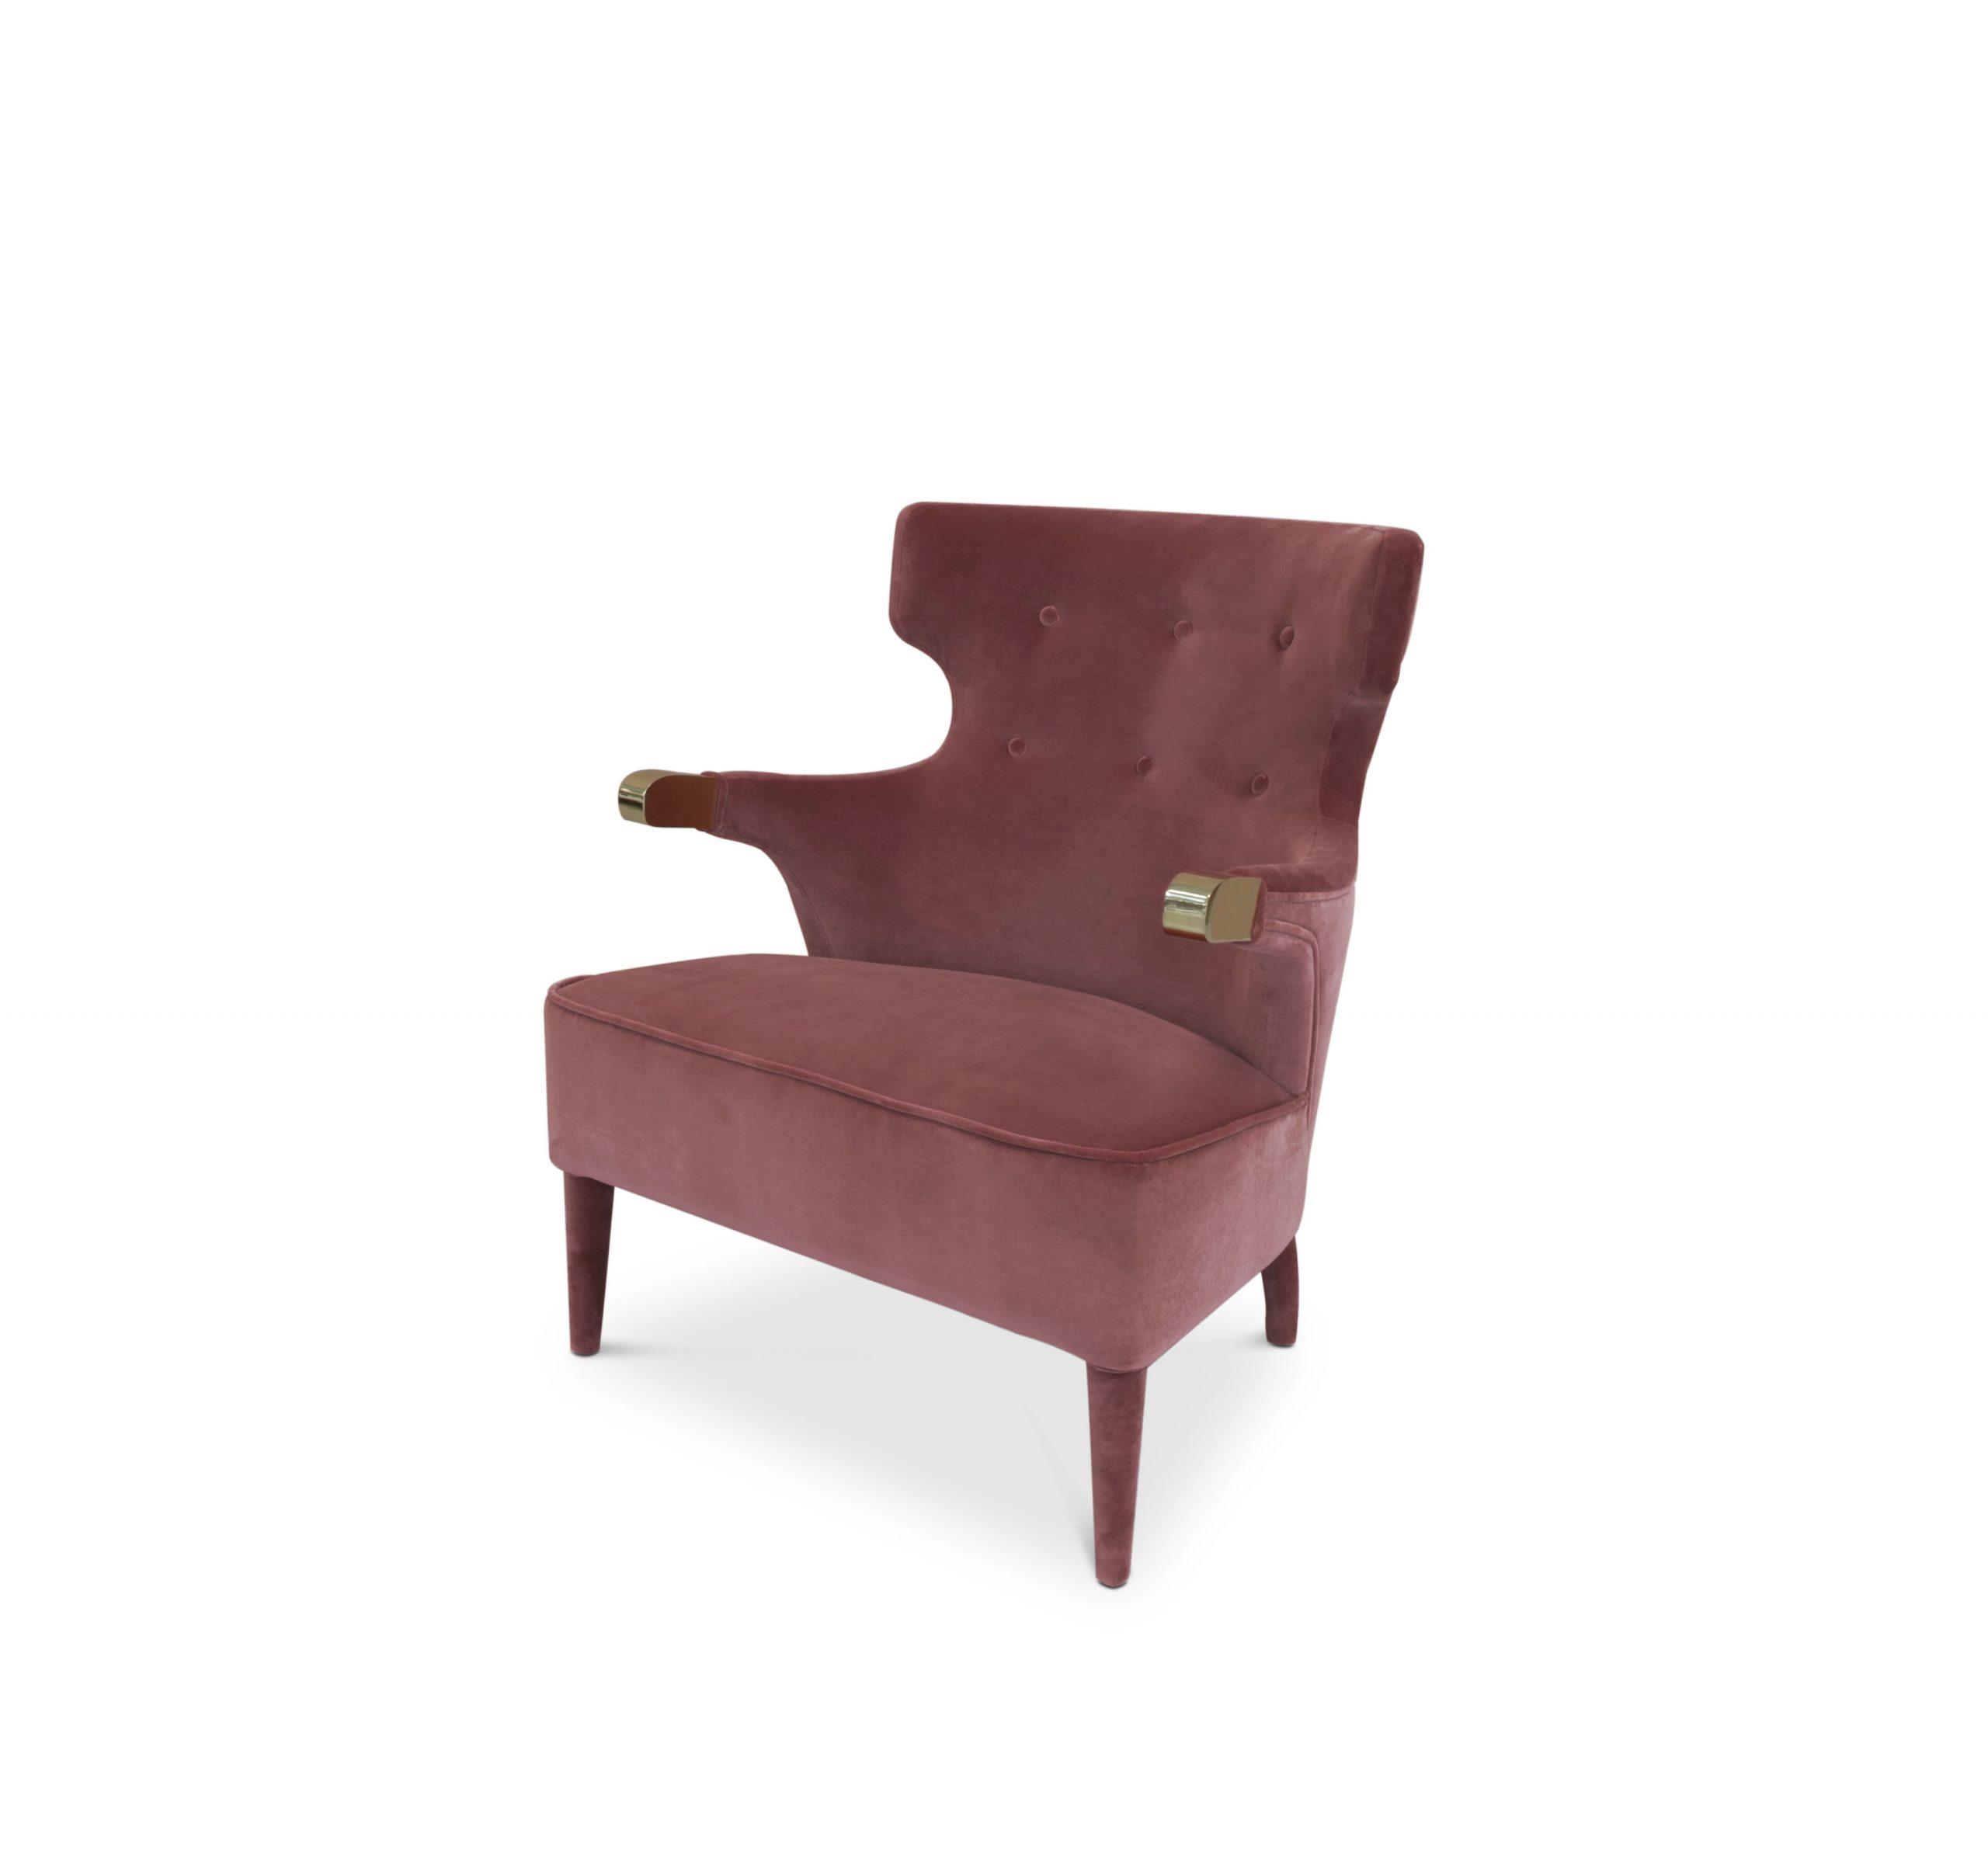 Animal Kingdom Furniture: Fierce Chairs Inspired By Animals animal kingdom furniture Animal Kingdom Furniture: Fierce Chairs Inspired By Animals Animal Kingdom Furniture Fierce Chairs Inspired By Animals 1 scaled